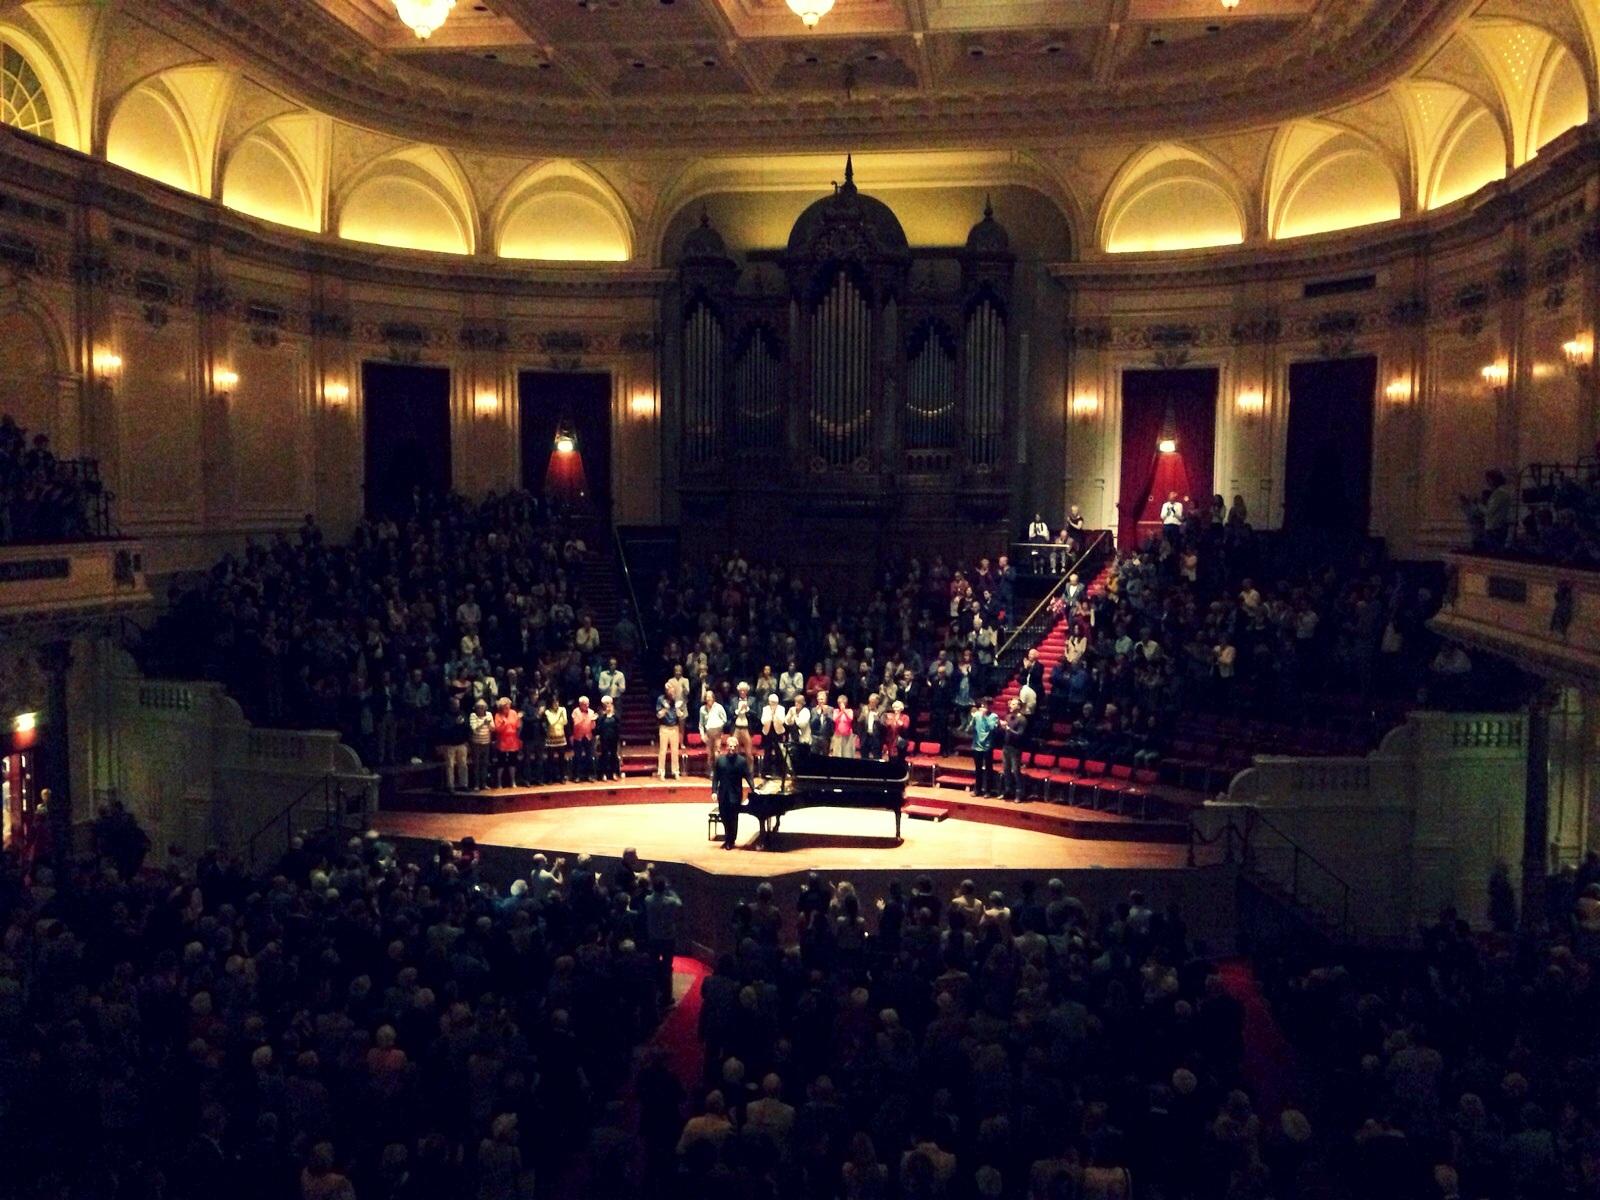 Concertgebouw, Amsterdam